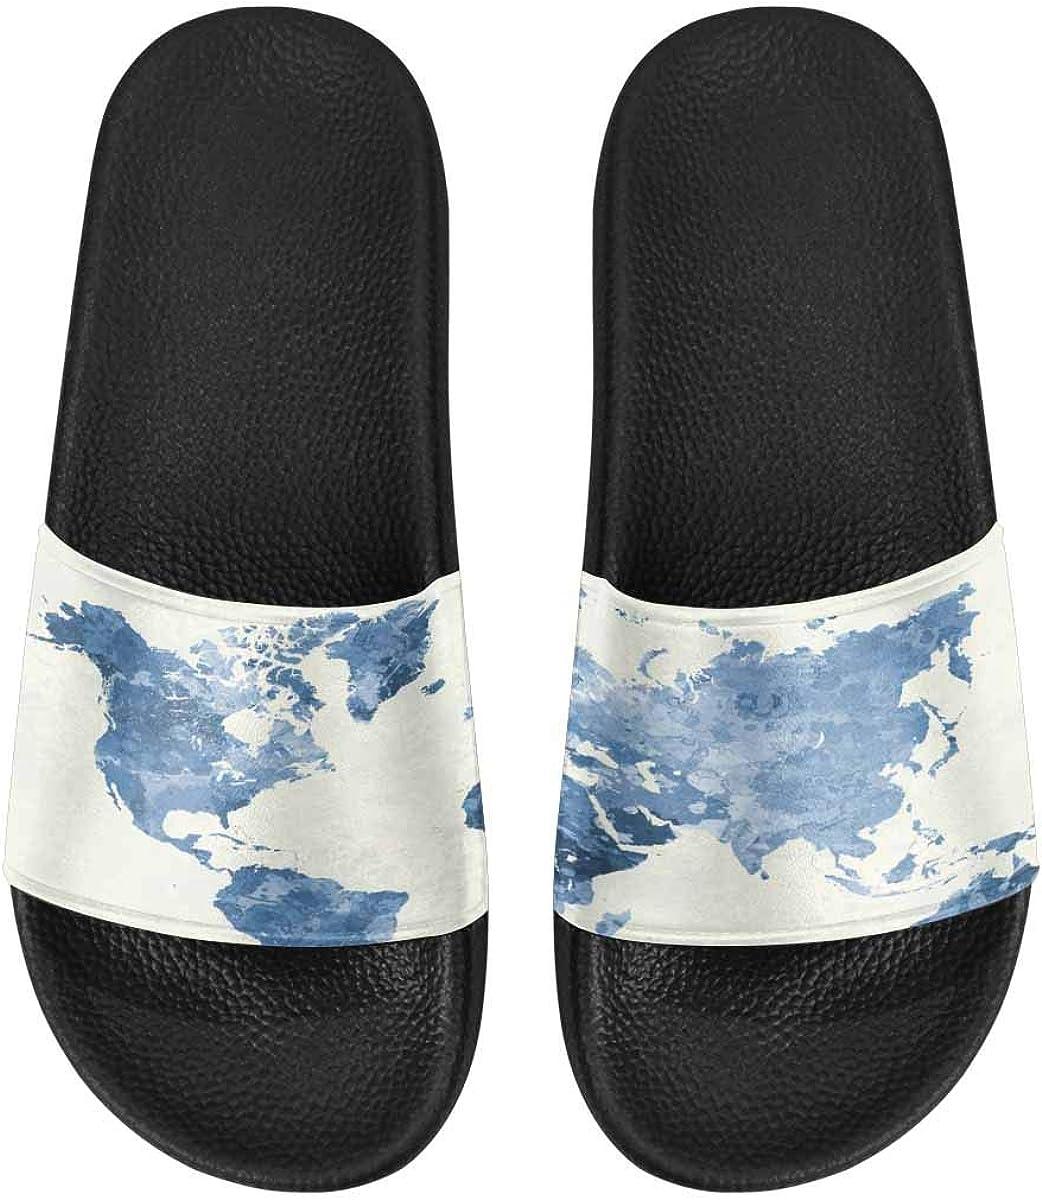 InterestPrint Slide Sandals for Women to Beach or Poor Snowman Santa Claus